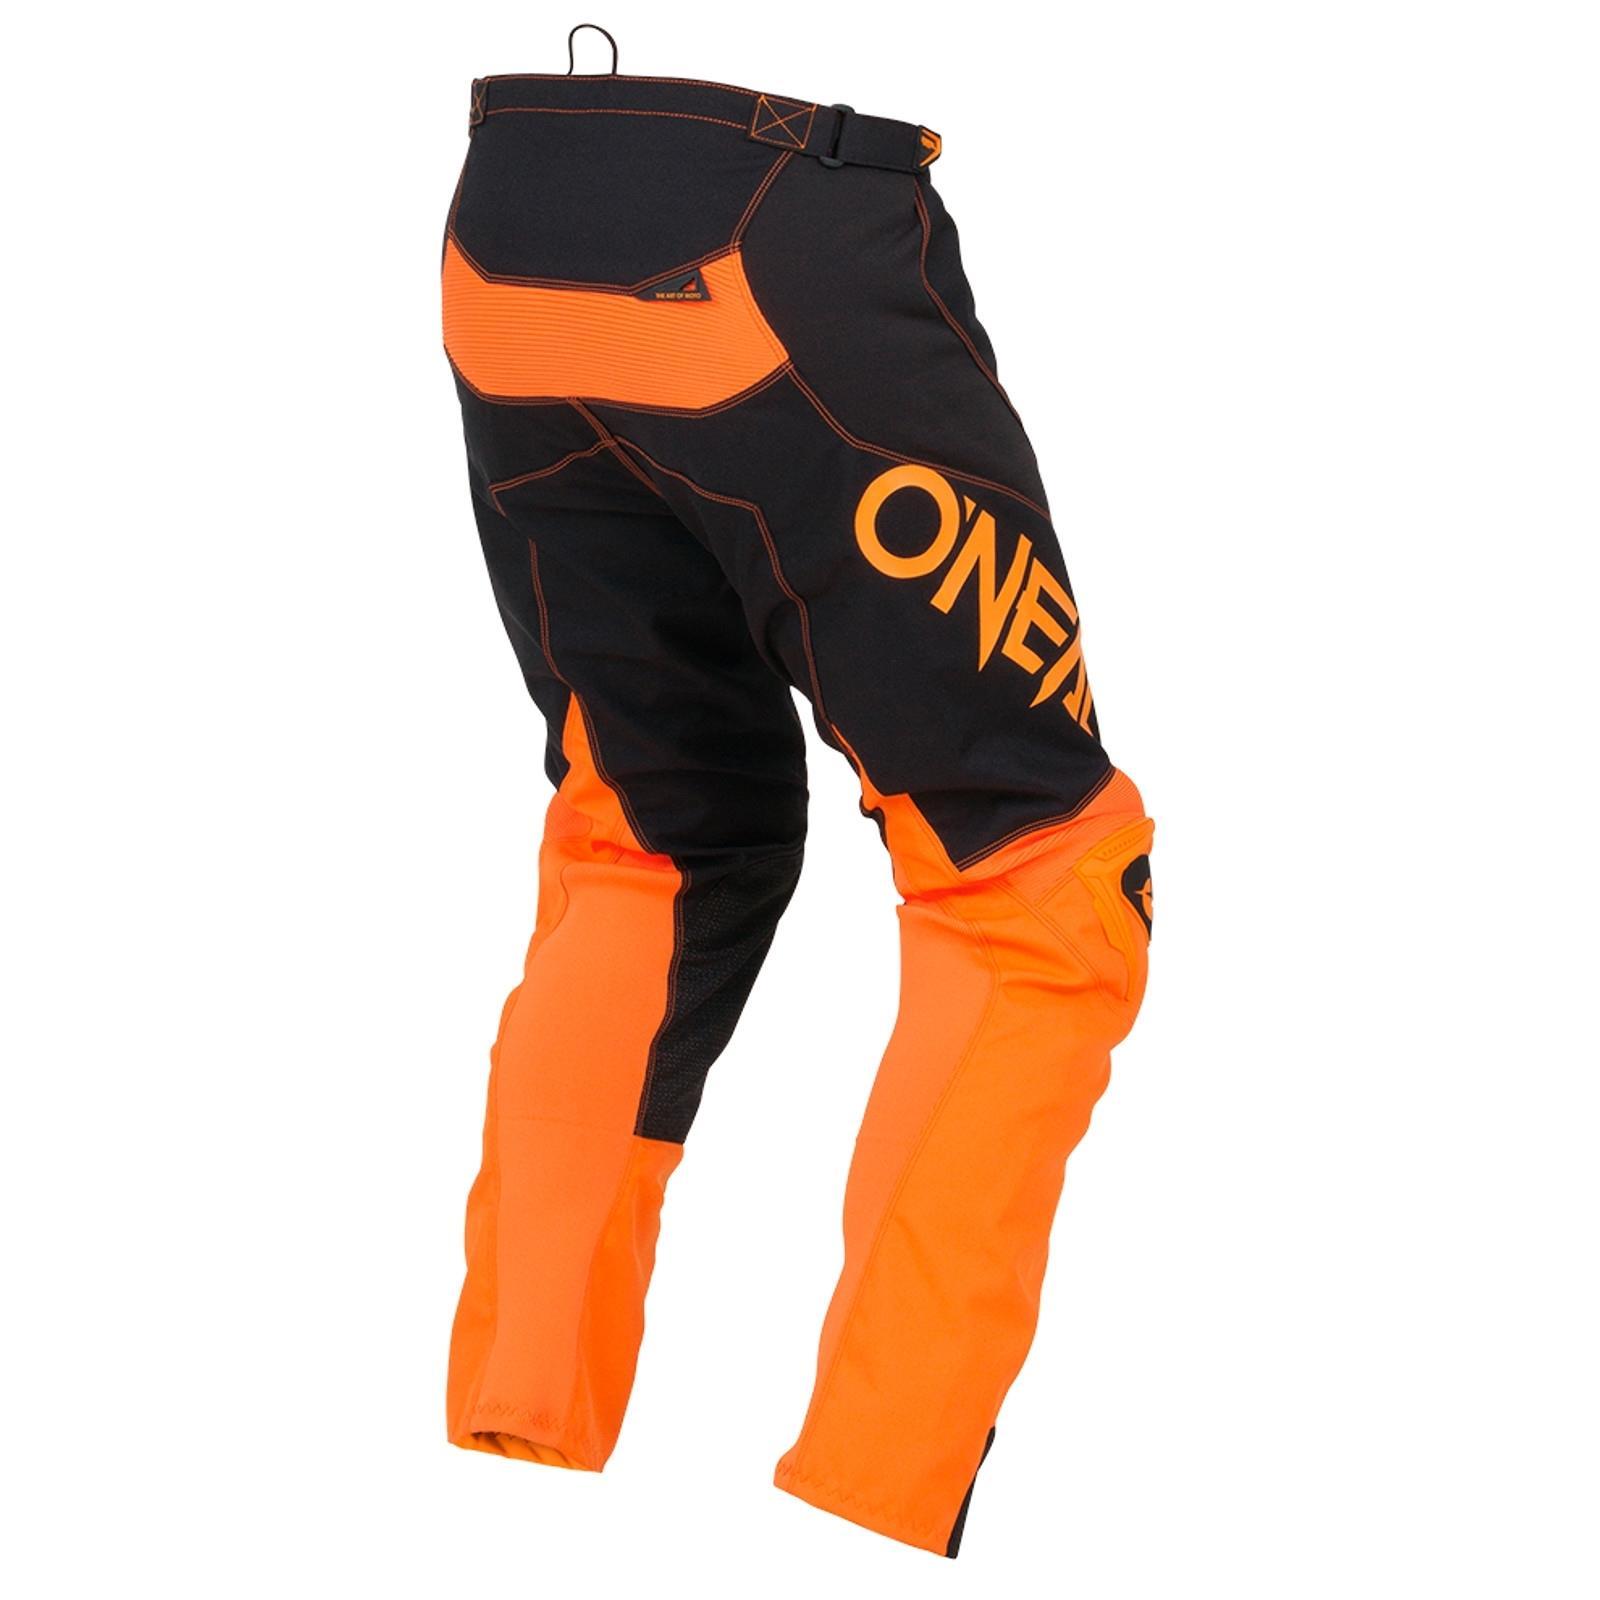 Oneal-elemento-Mayhem-Hardwear-Pants-pantalones-MX-DH-FR-Moto-Cross-Enduro-MTB-moto miniatura 55